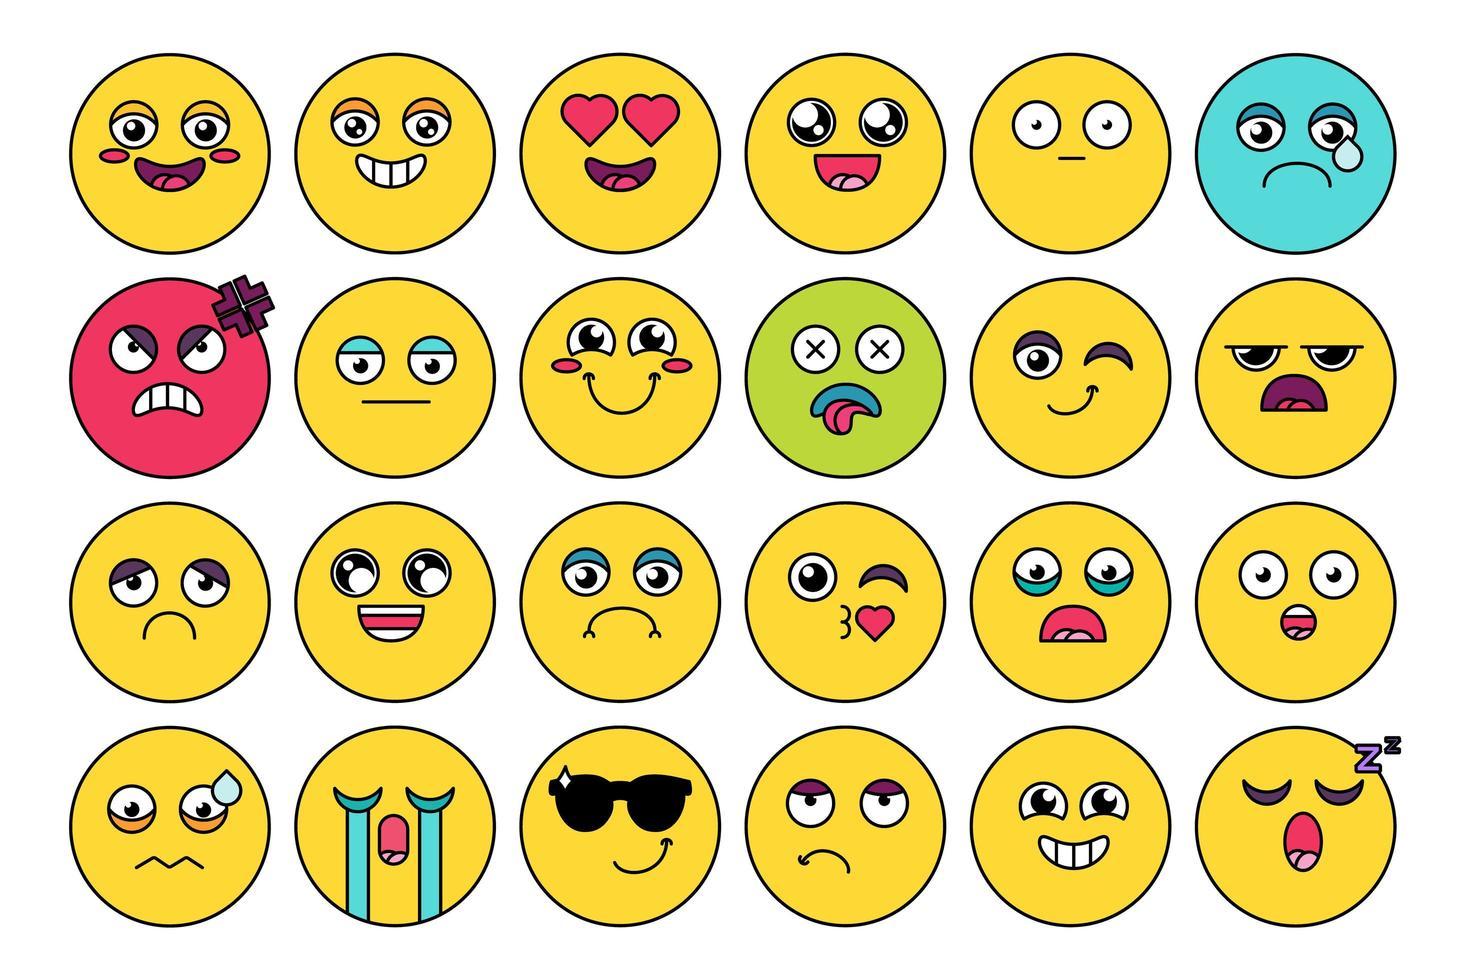 pacote de adesivos emojis fofos e cômicos vetor